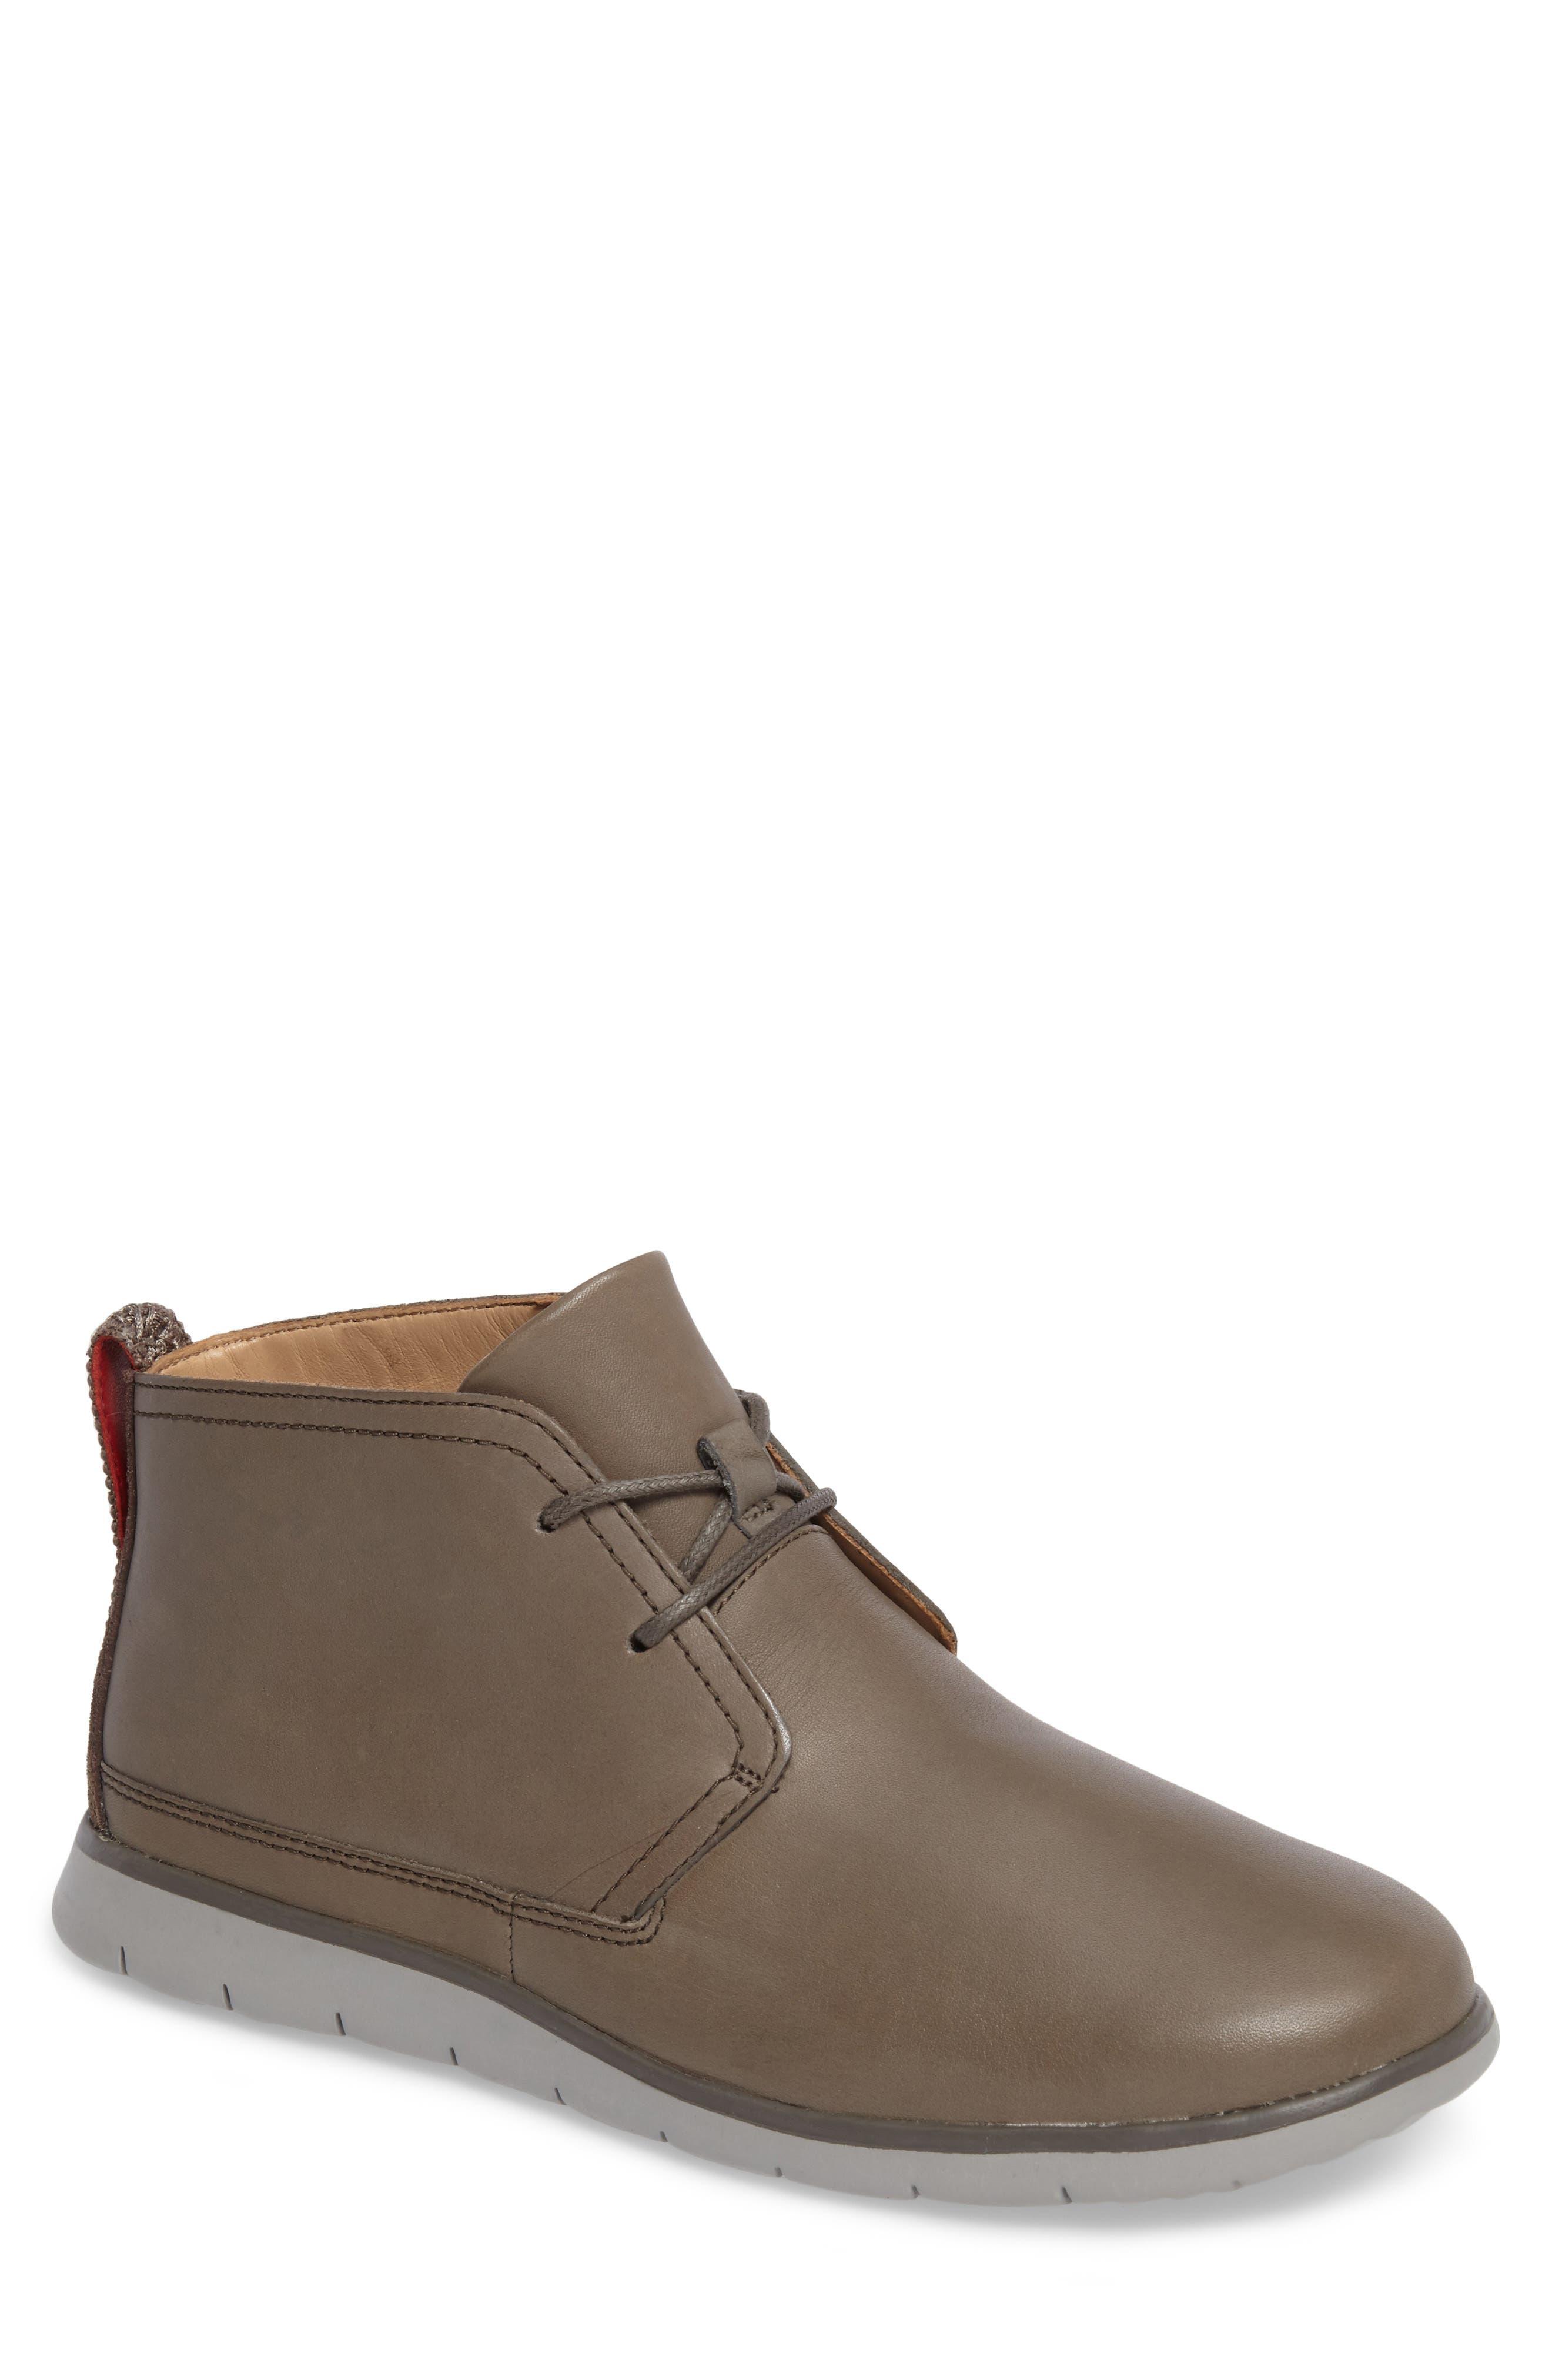 Freamon Chukka Boot,                         Main,                         color, Brindle